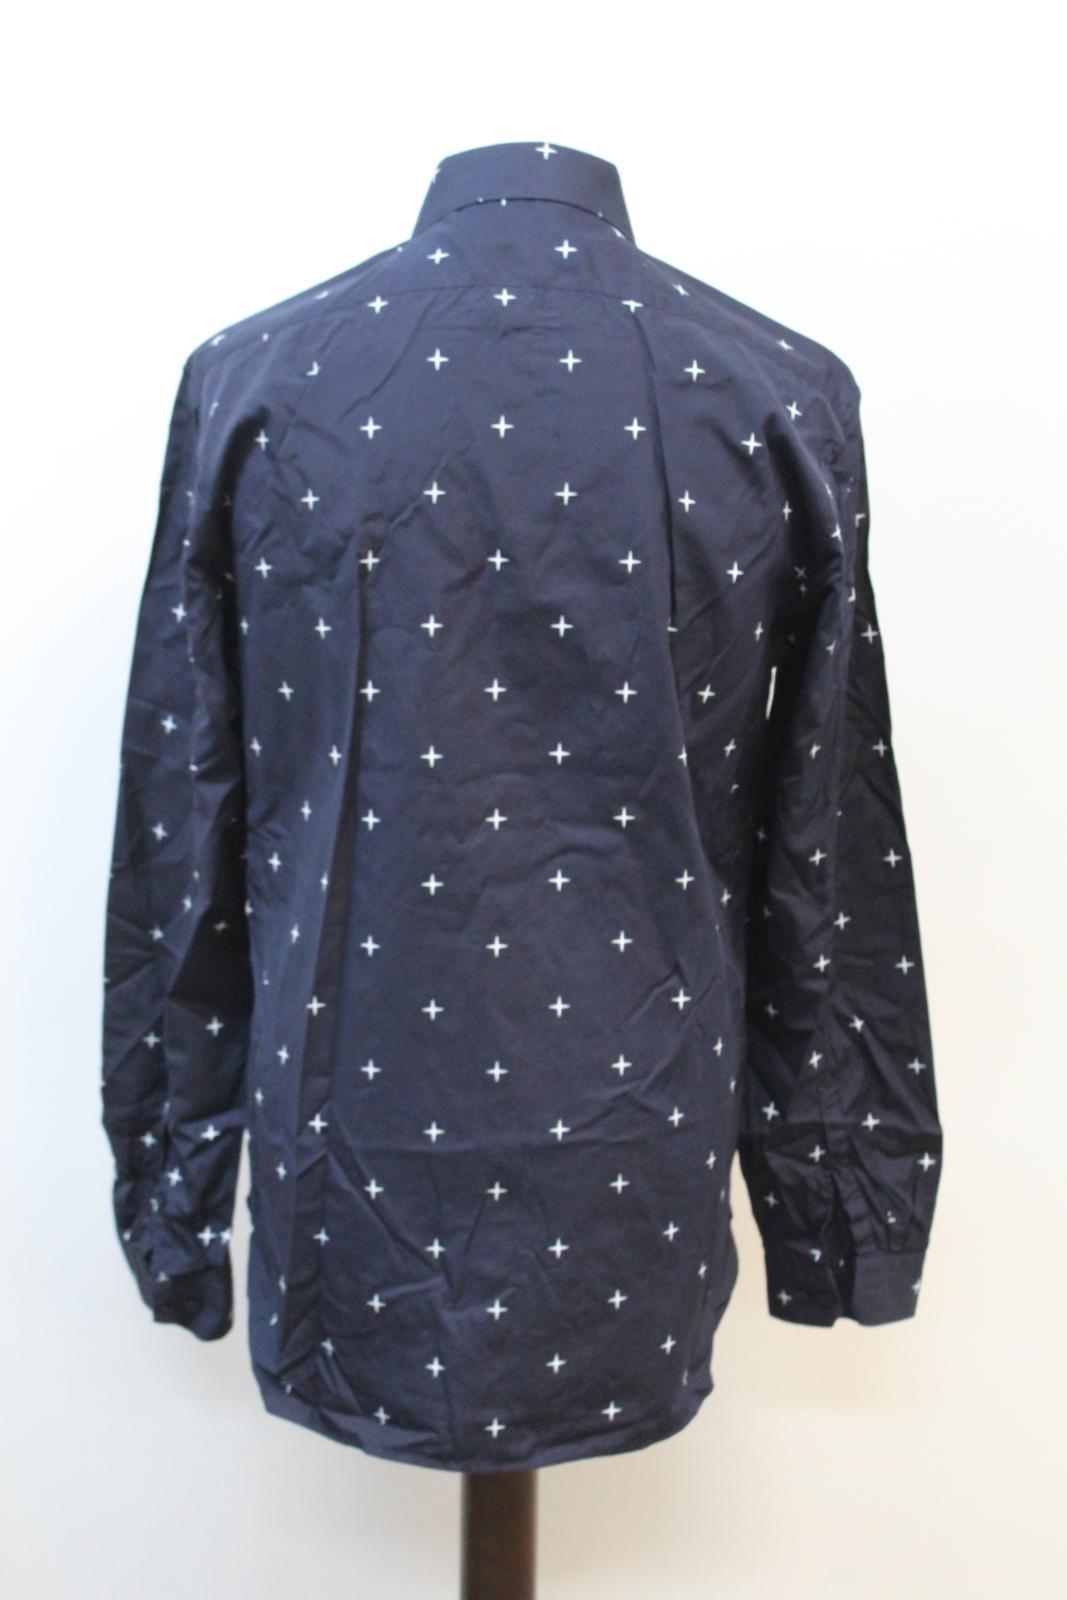 Neil-Barrett-Hombre-Azul-Marino-Blanco-Cuello-De-Camisa-formal-calce-Cruz-16-5-034-42cm miniatura 5